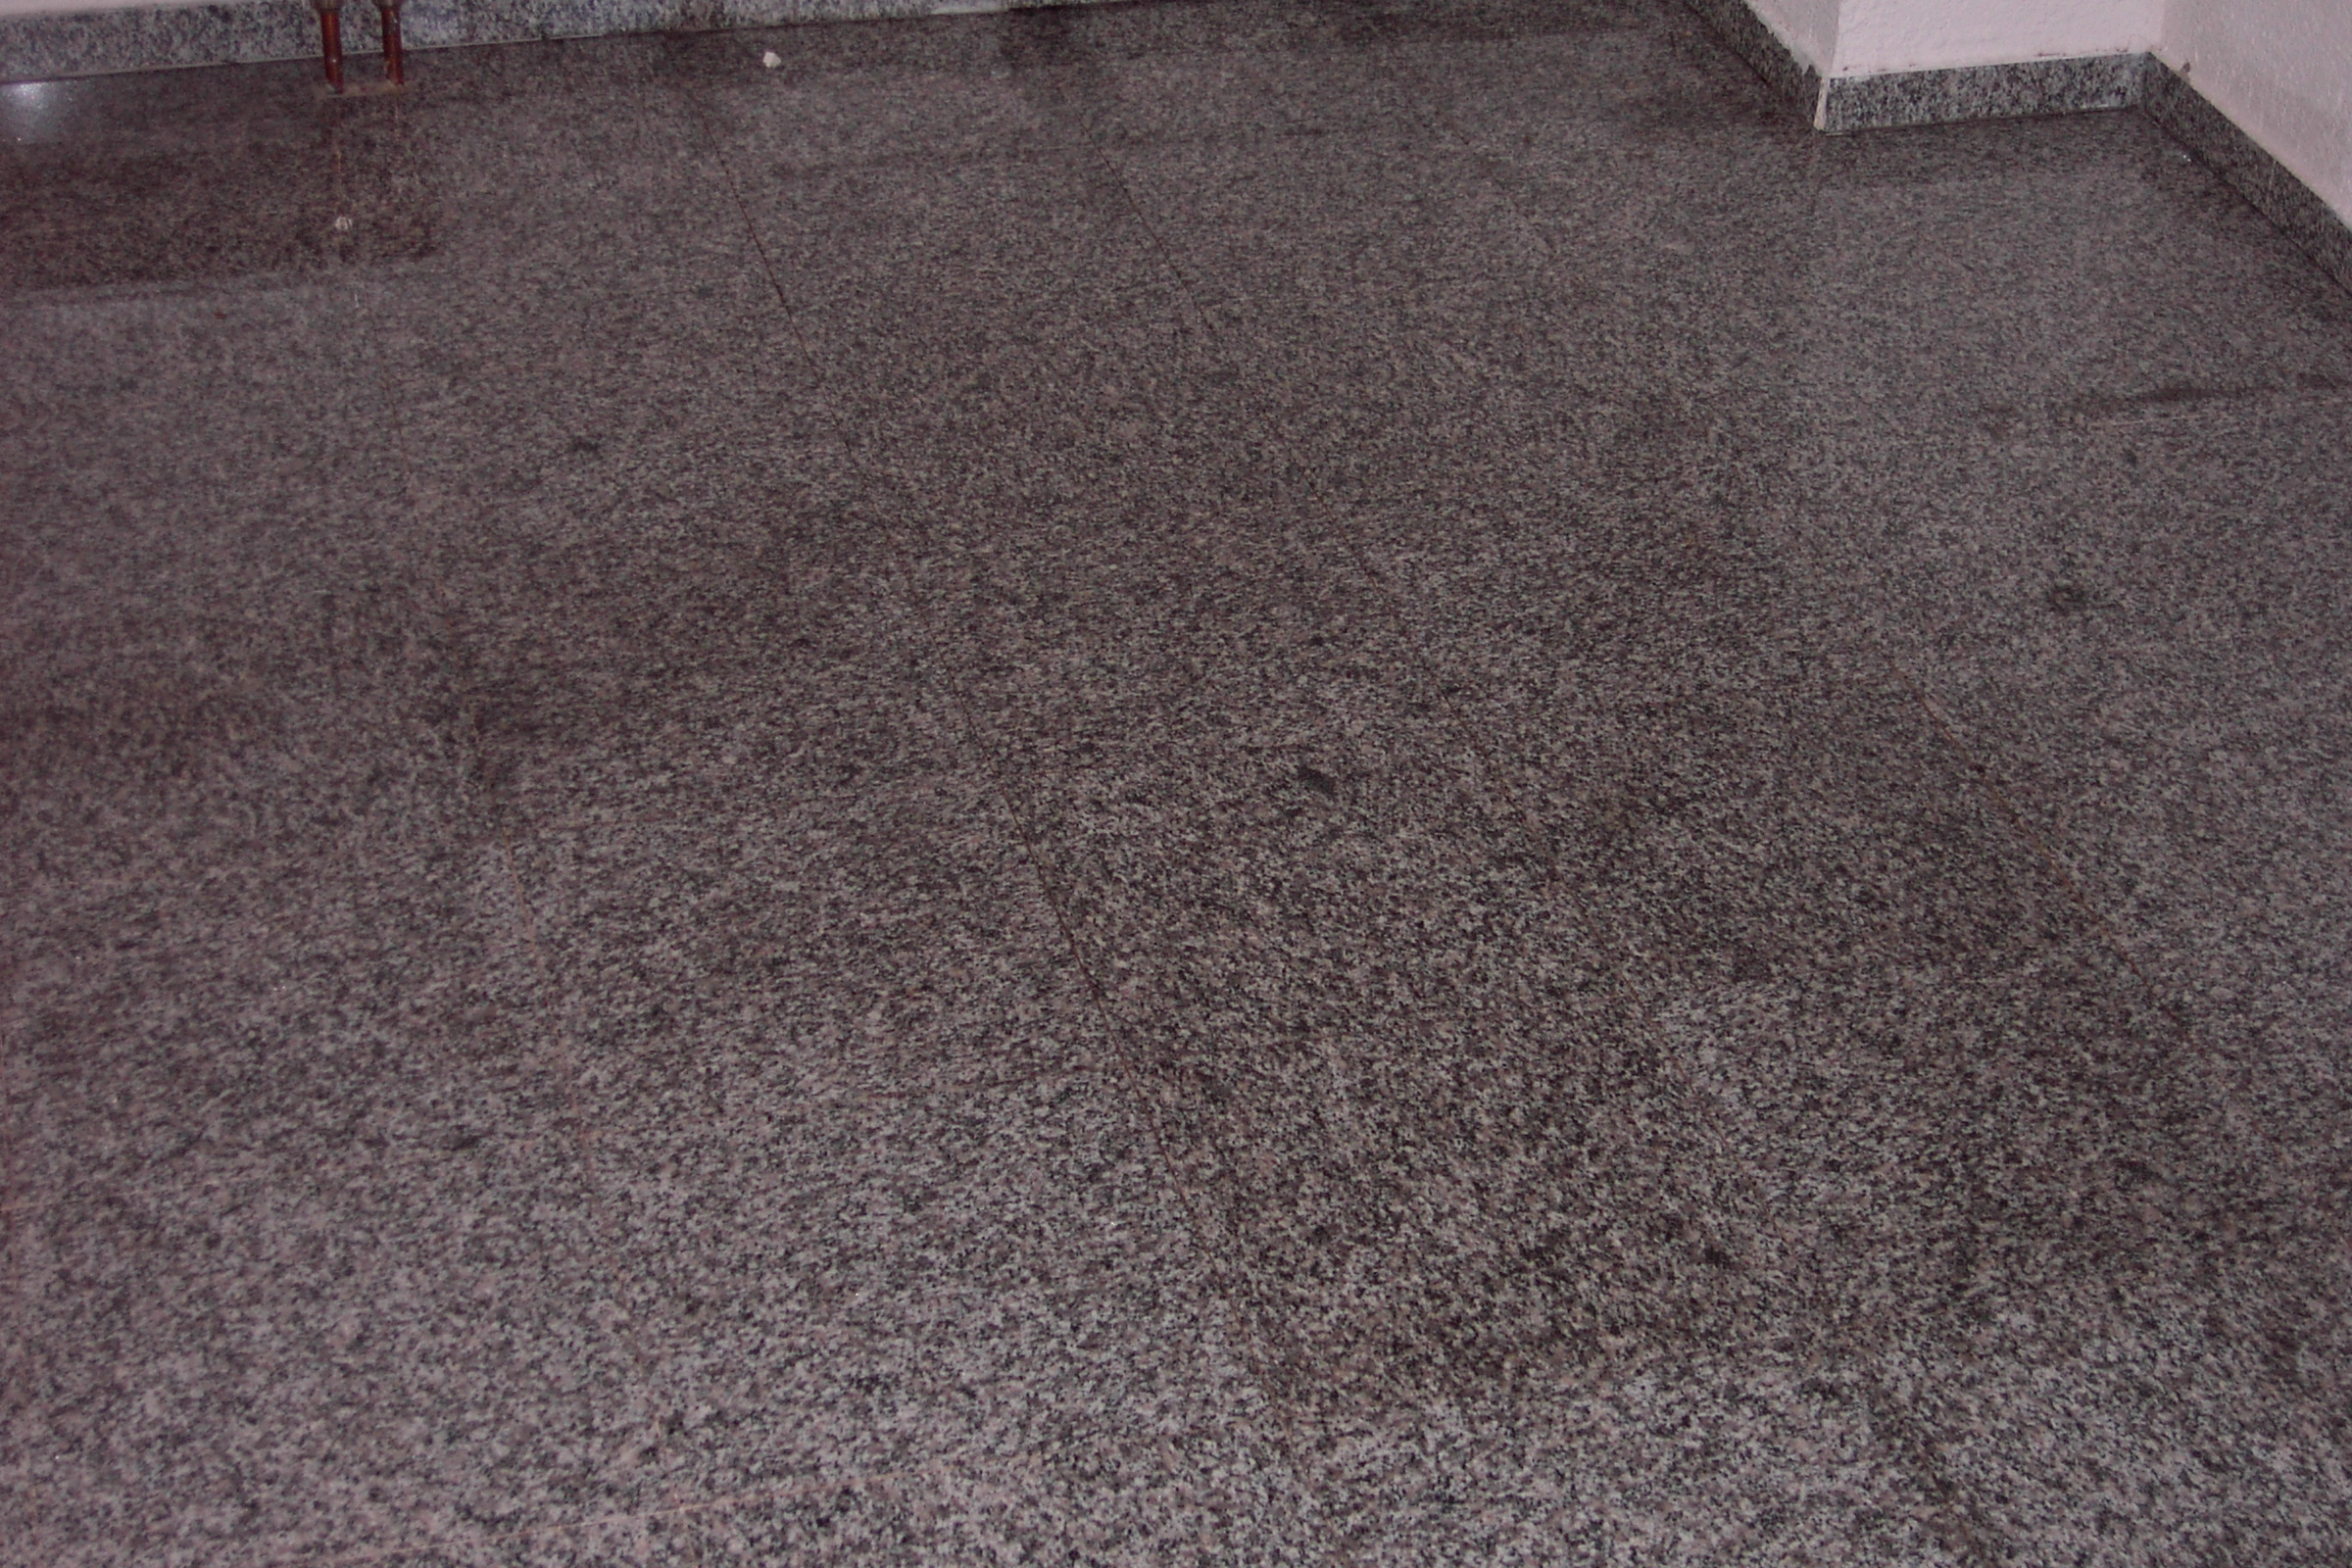 granitboden hat flecken haus garten forum. Black Bedroom Furniture Sets. Home Design Ideas